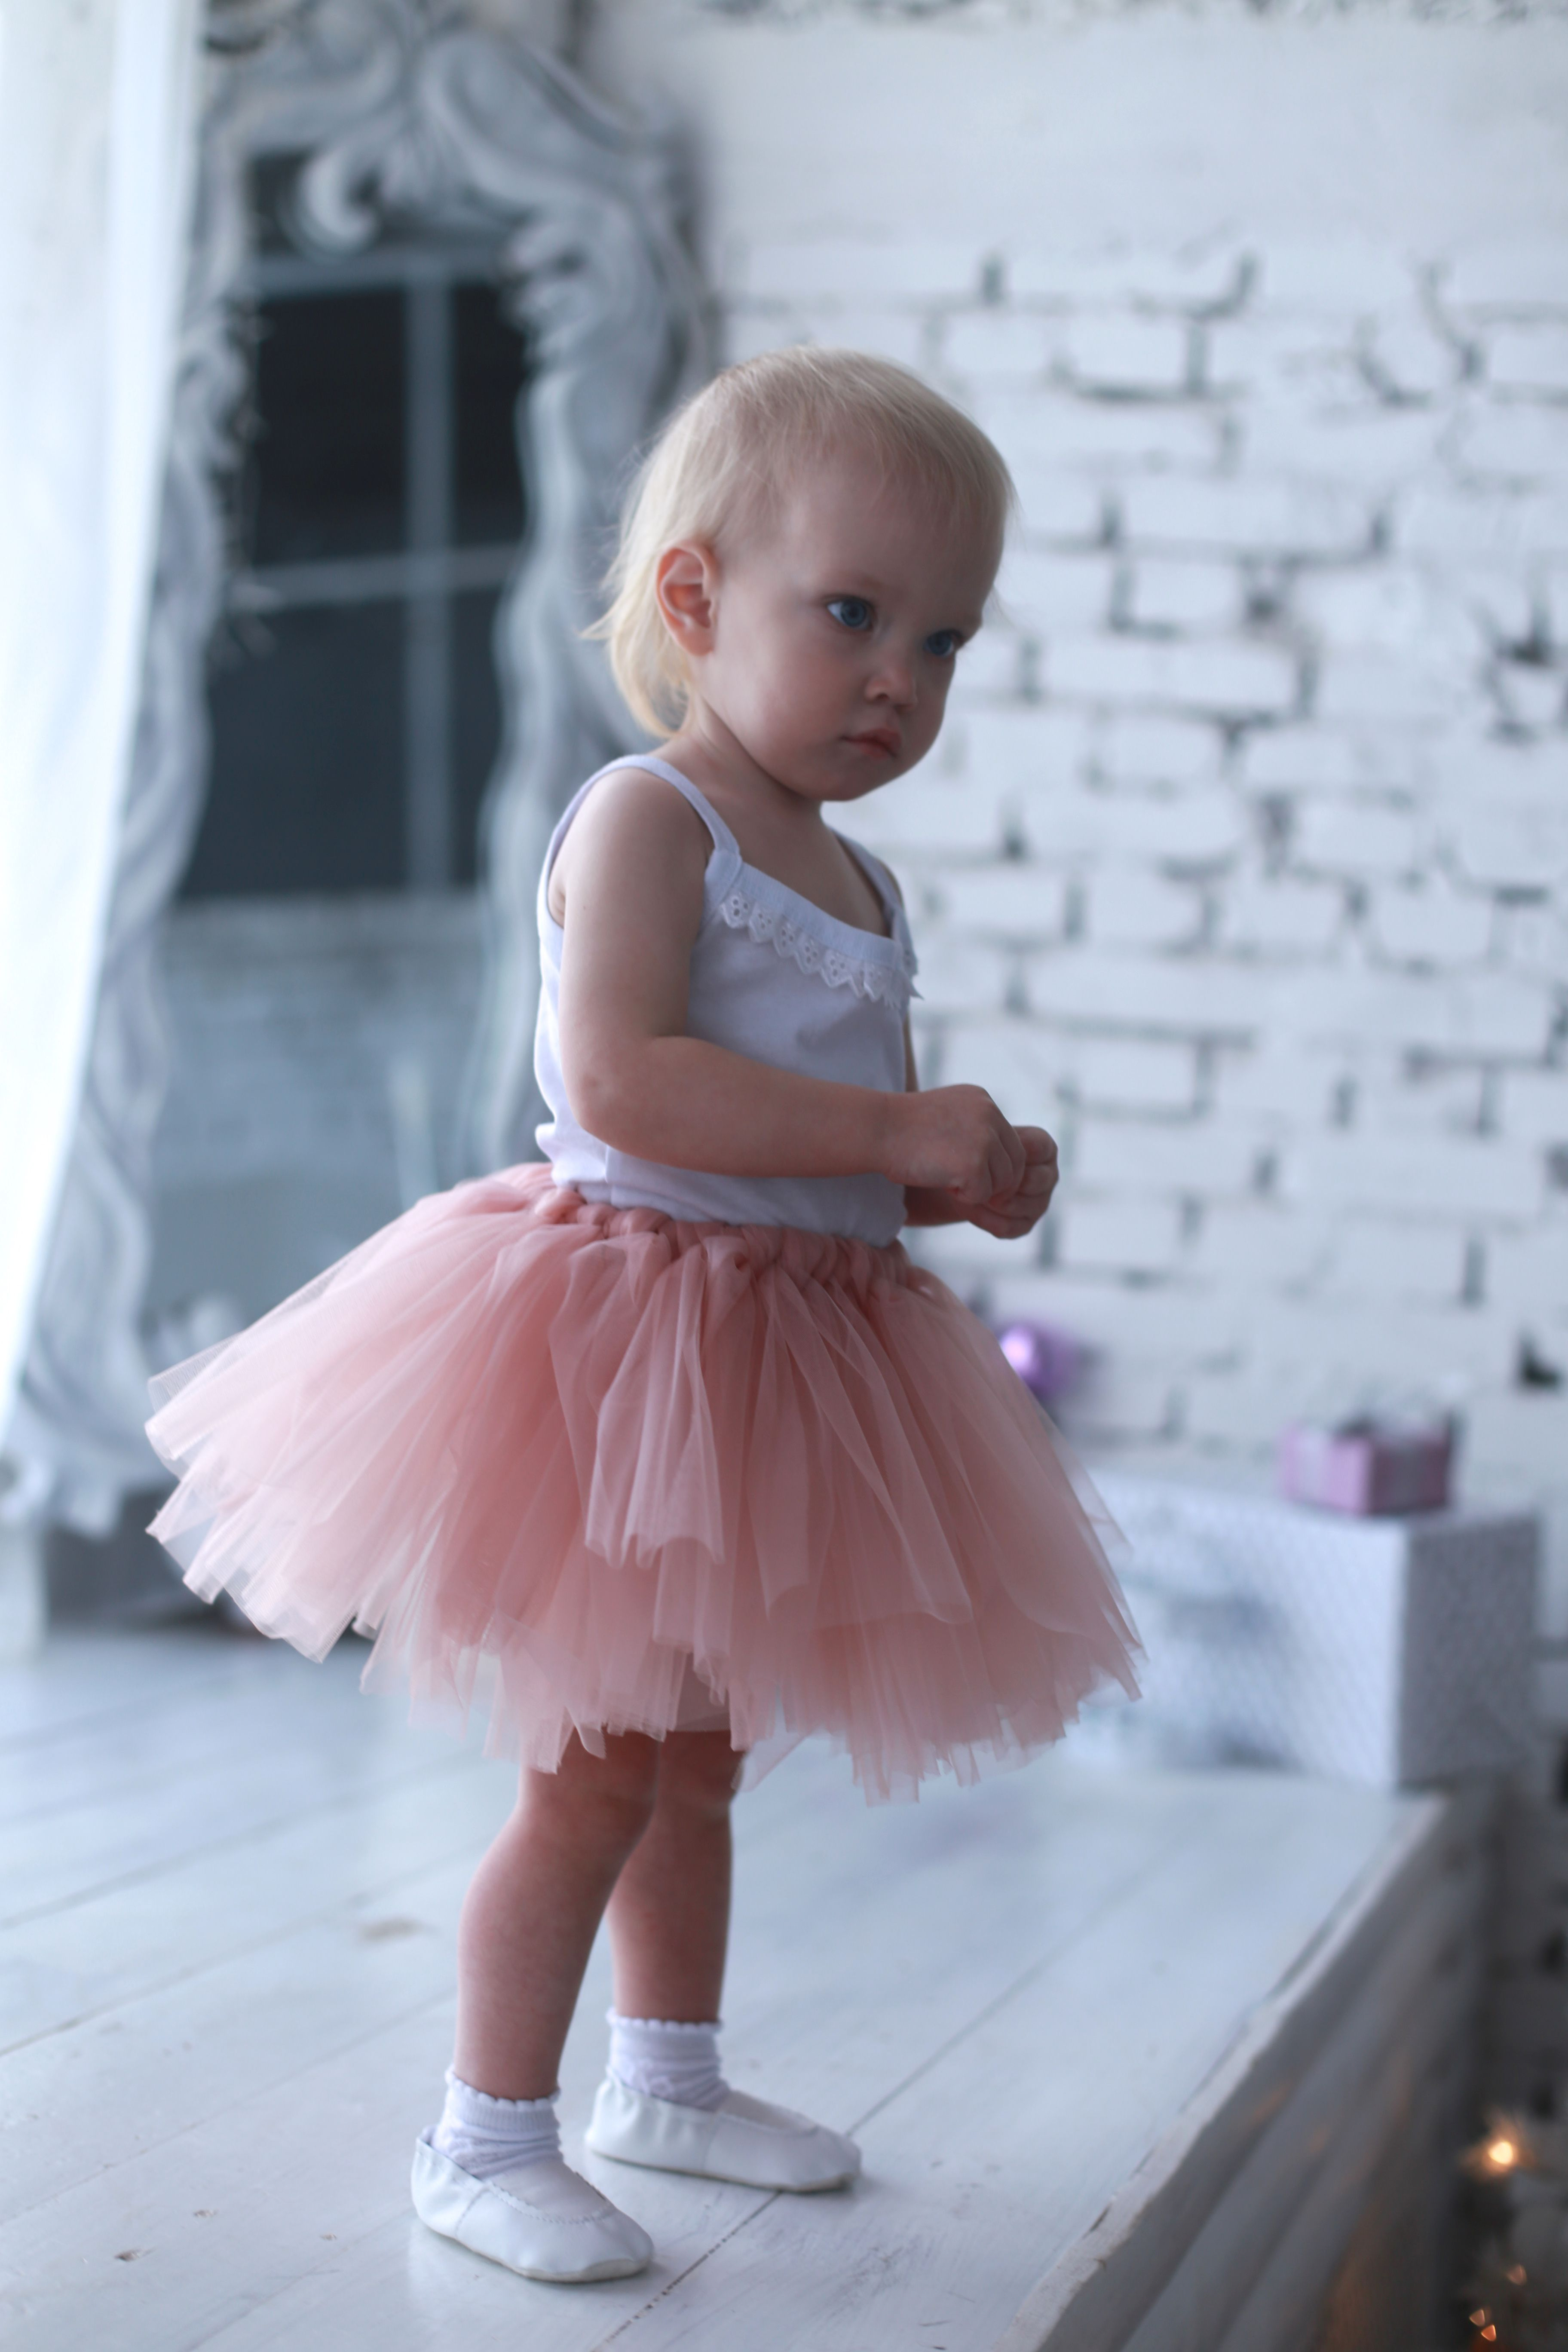 Infant Tulle Tutus Baby Girls Tutu Skirt Newborn Soft Skirts for Toddlers